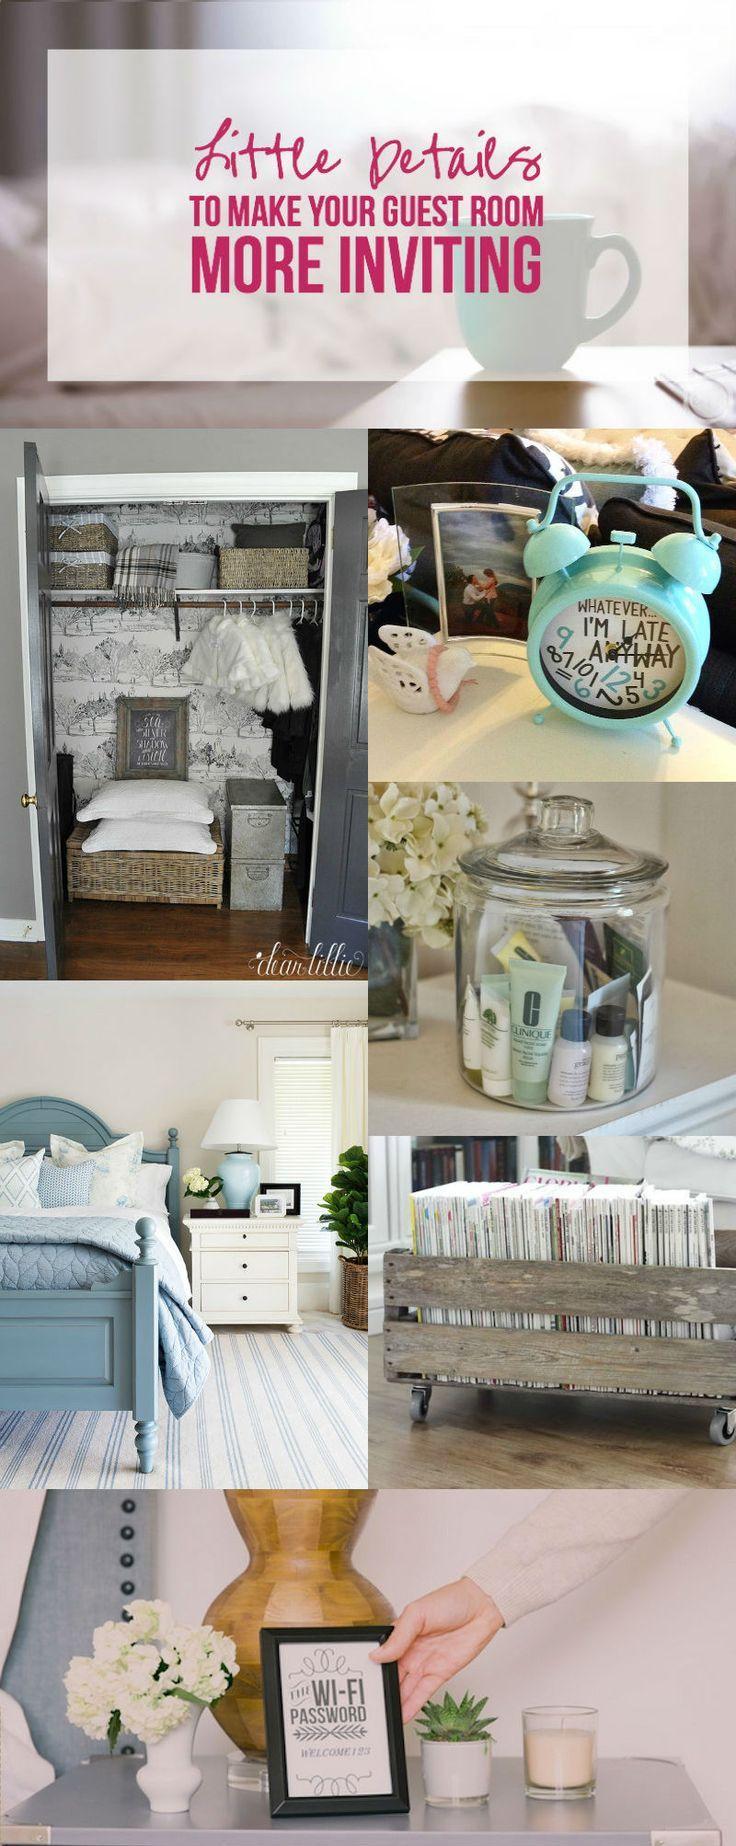 Little Details to Make Your Guest Room More Inviting | Diy deko ...